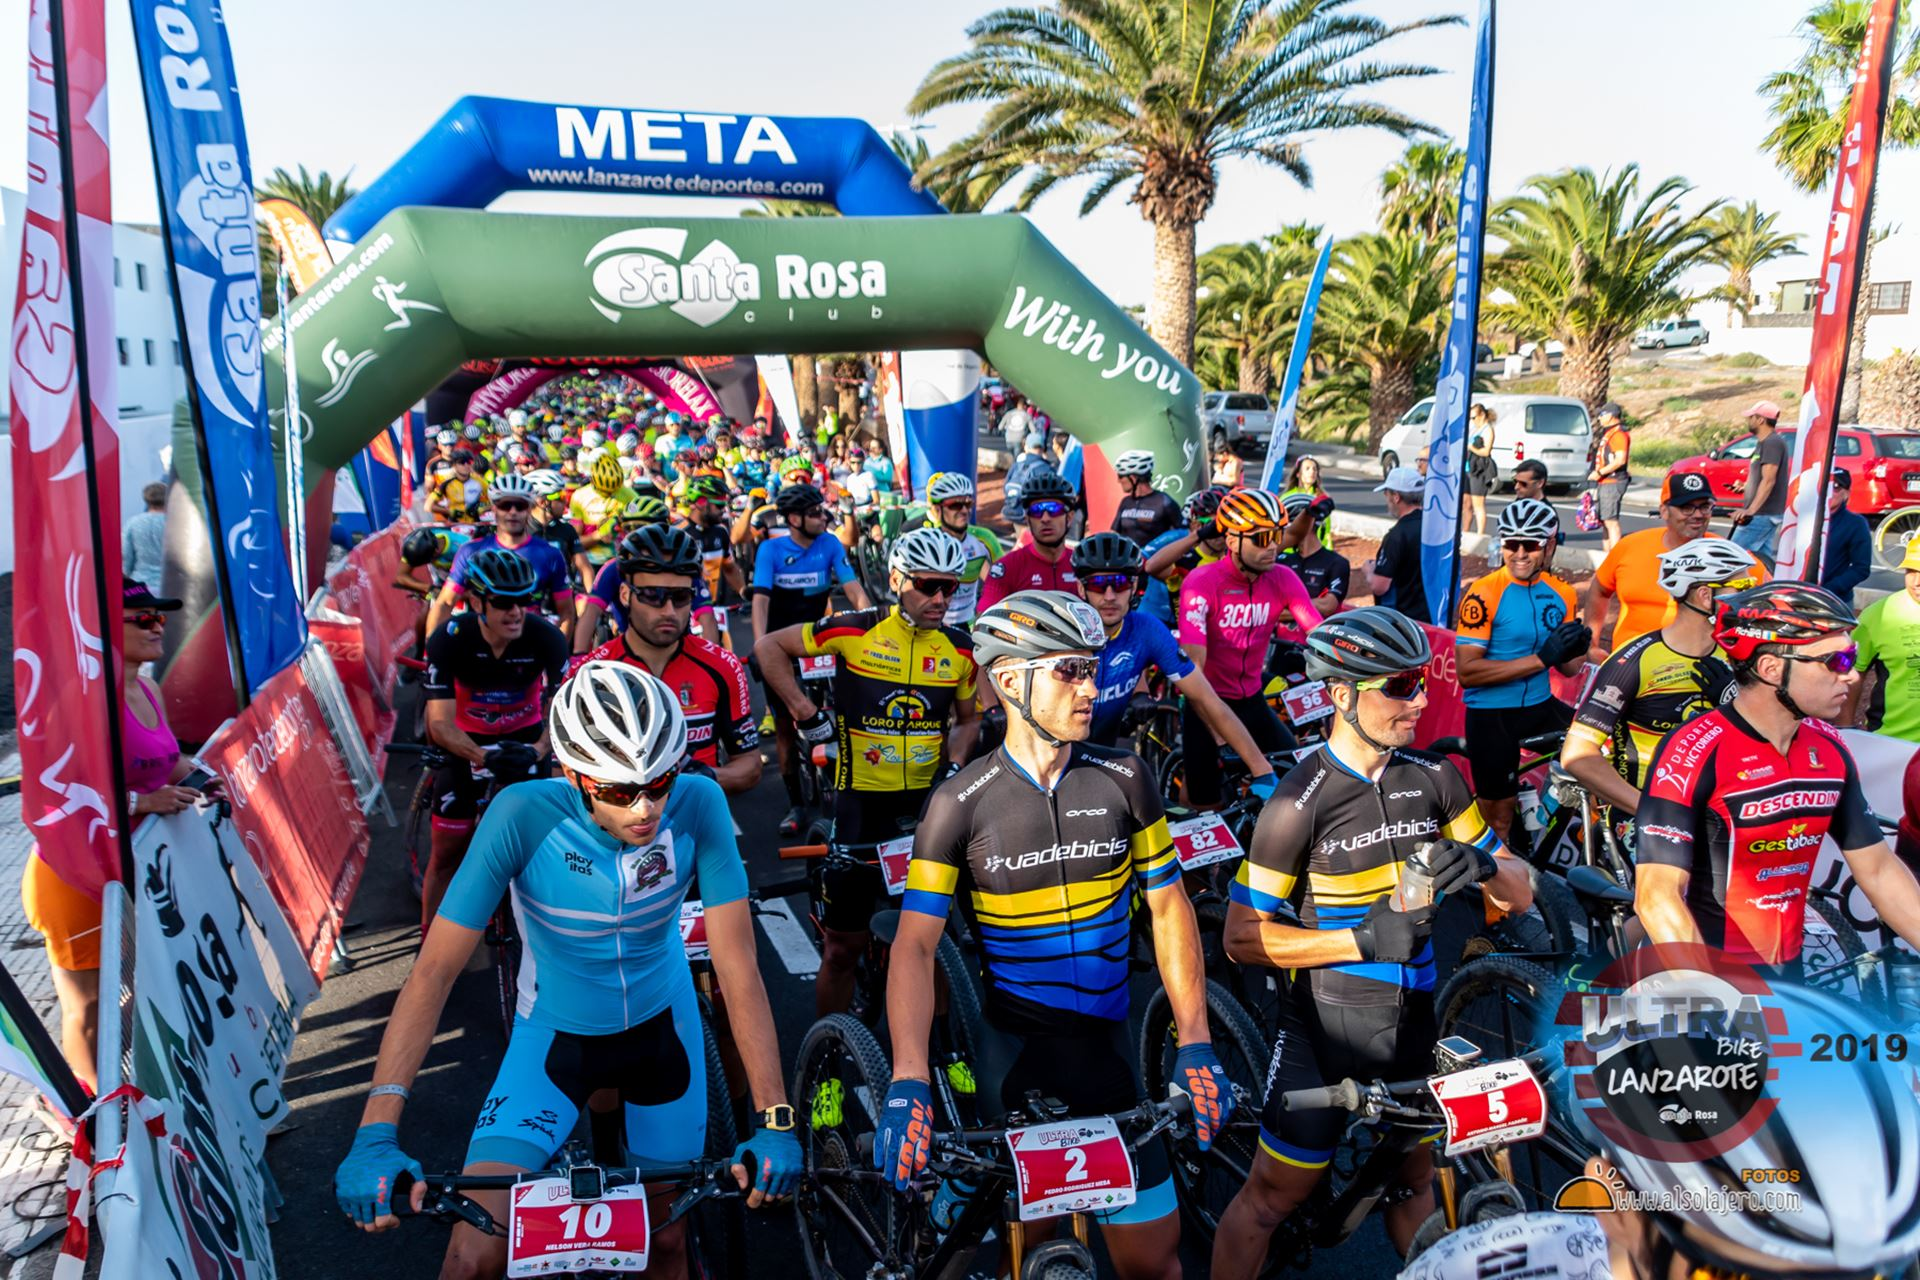 Salida 2ª Etapa Ultrabike 2019 Fotos Alsolajero.com-18